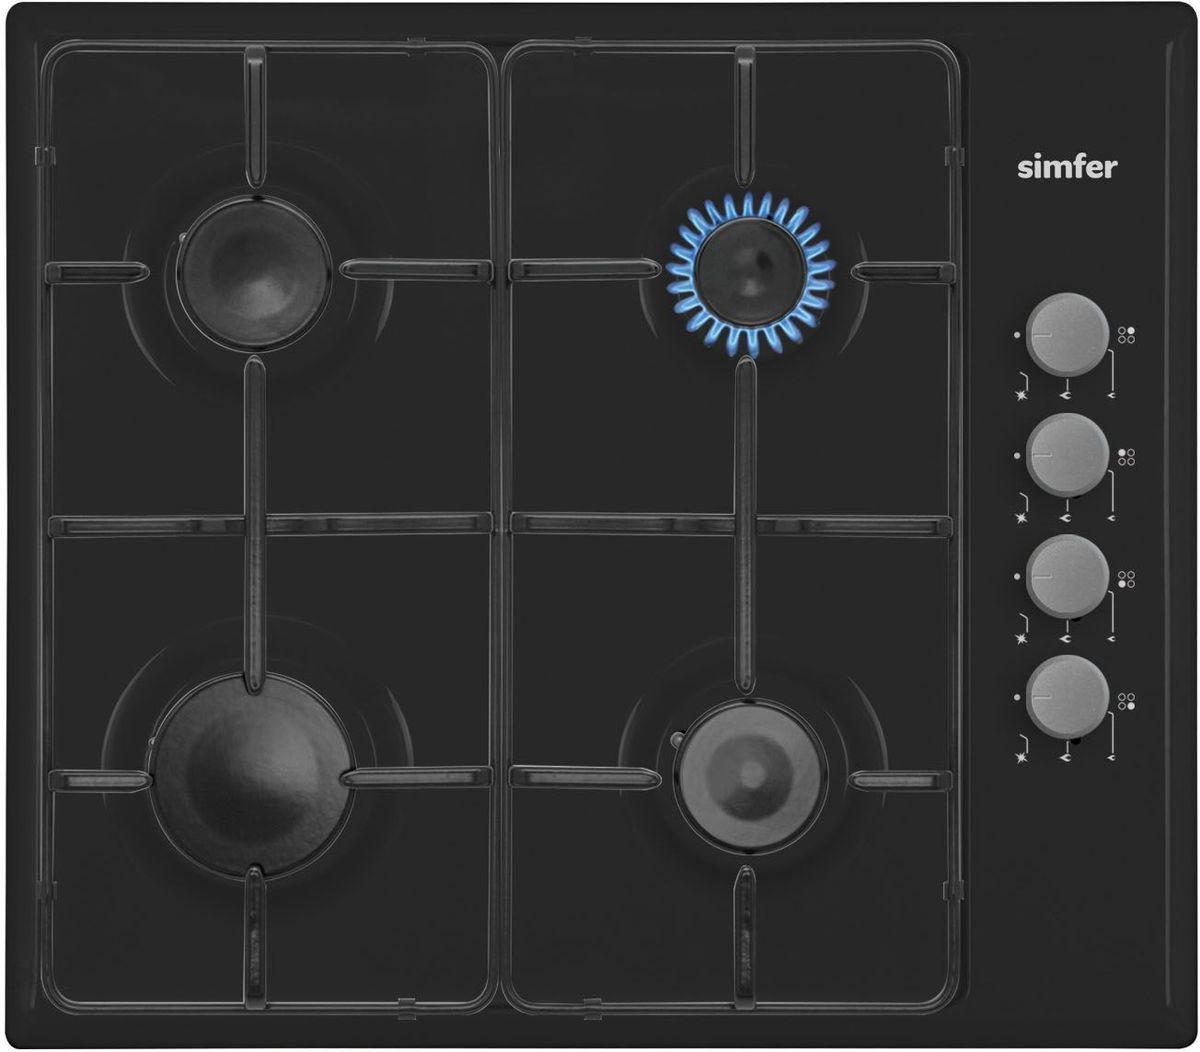 Simfer H60Q40B411 панель варочная газовая